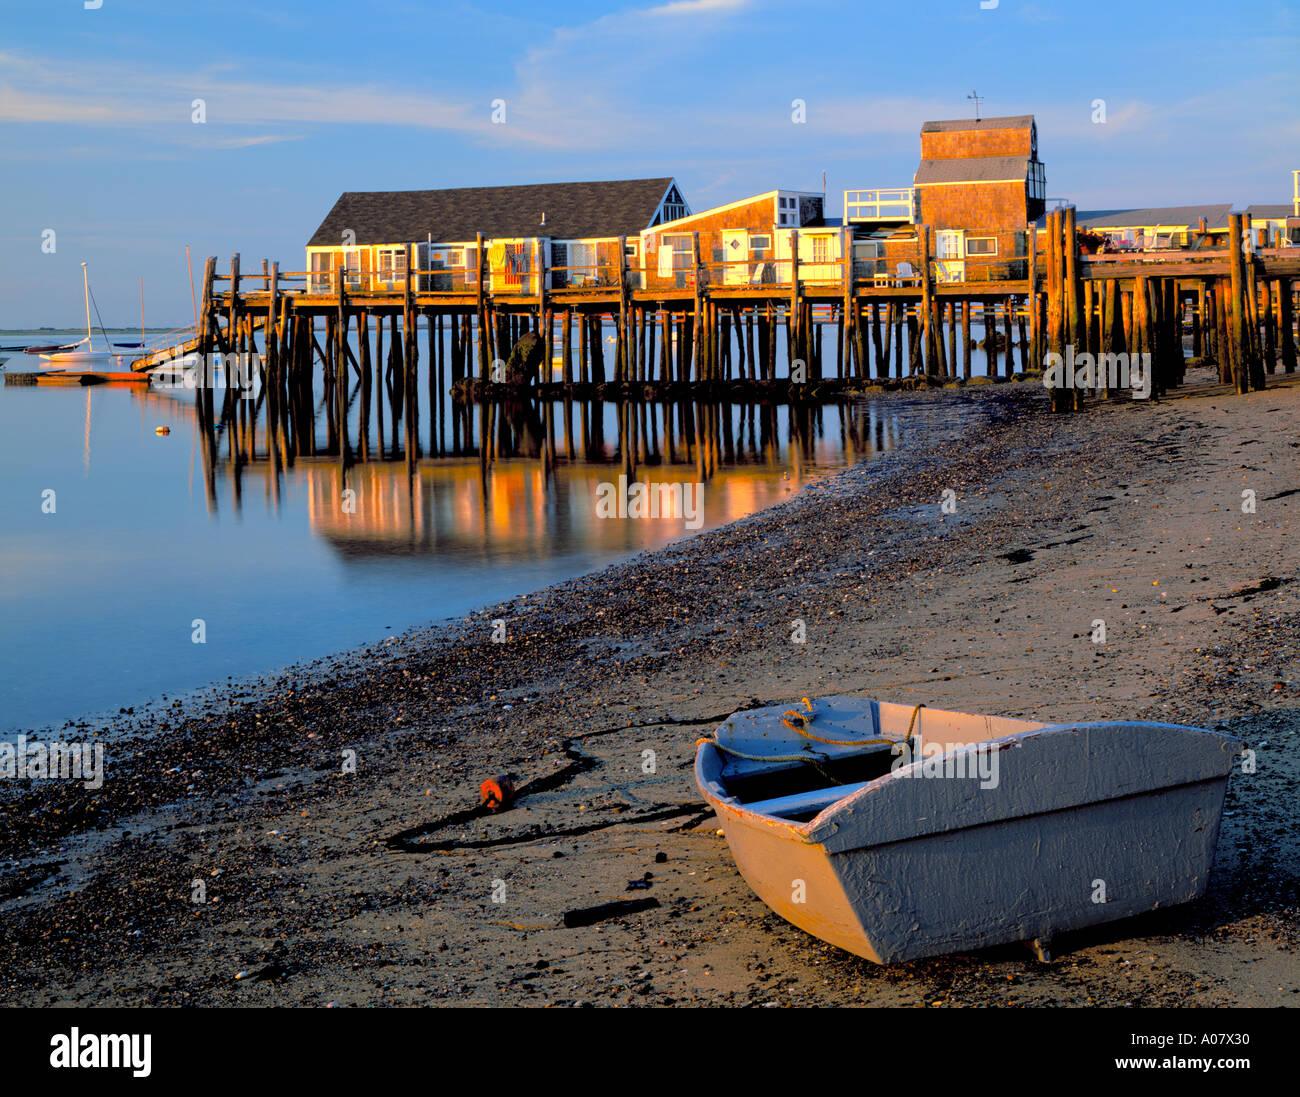 Cape Cod National Sea Shore: Cape Cod National Seashore, MA: Dinghy Stranded At Low